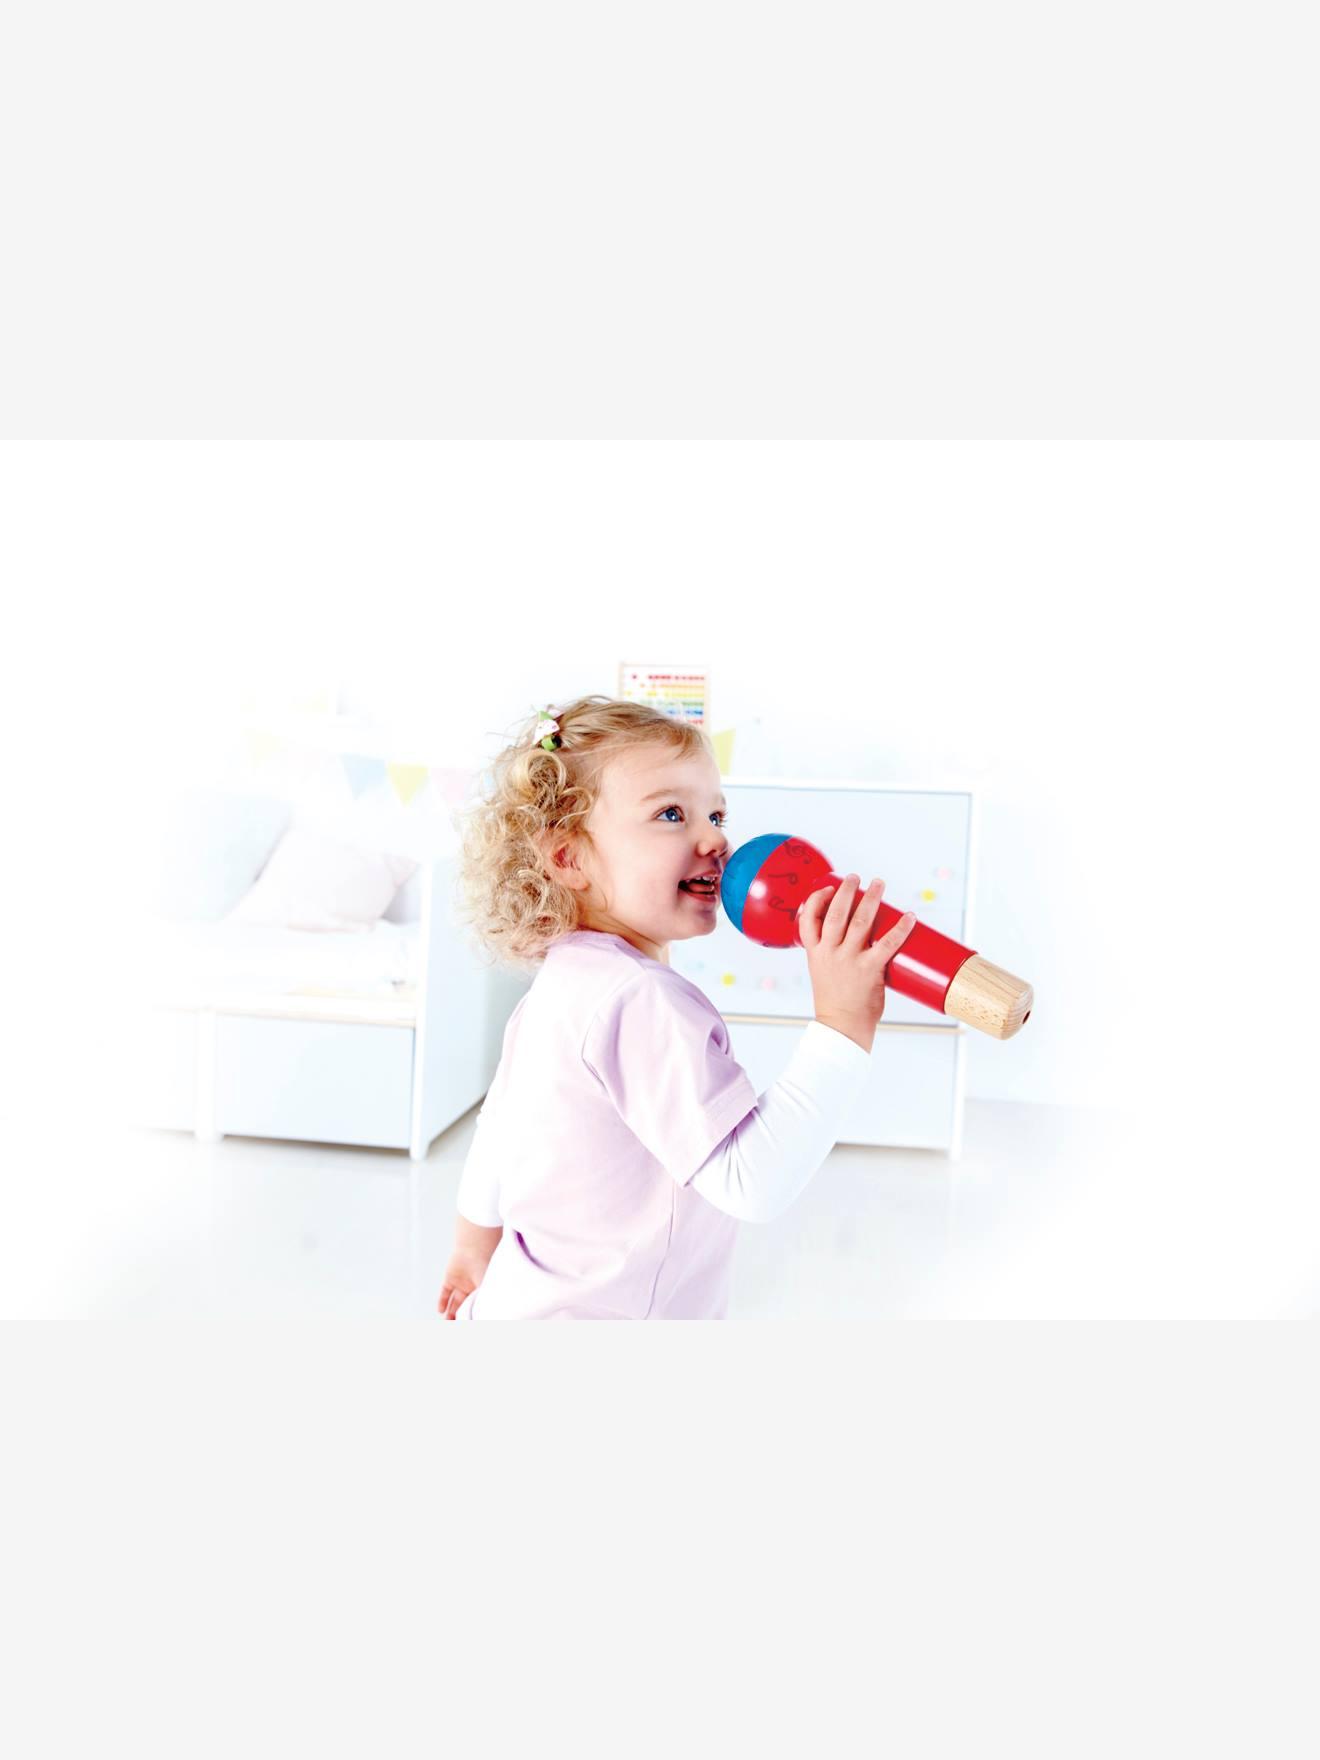 Spiel-Mikrofon für Kinder aus Holz HAPE rot Gr....